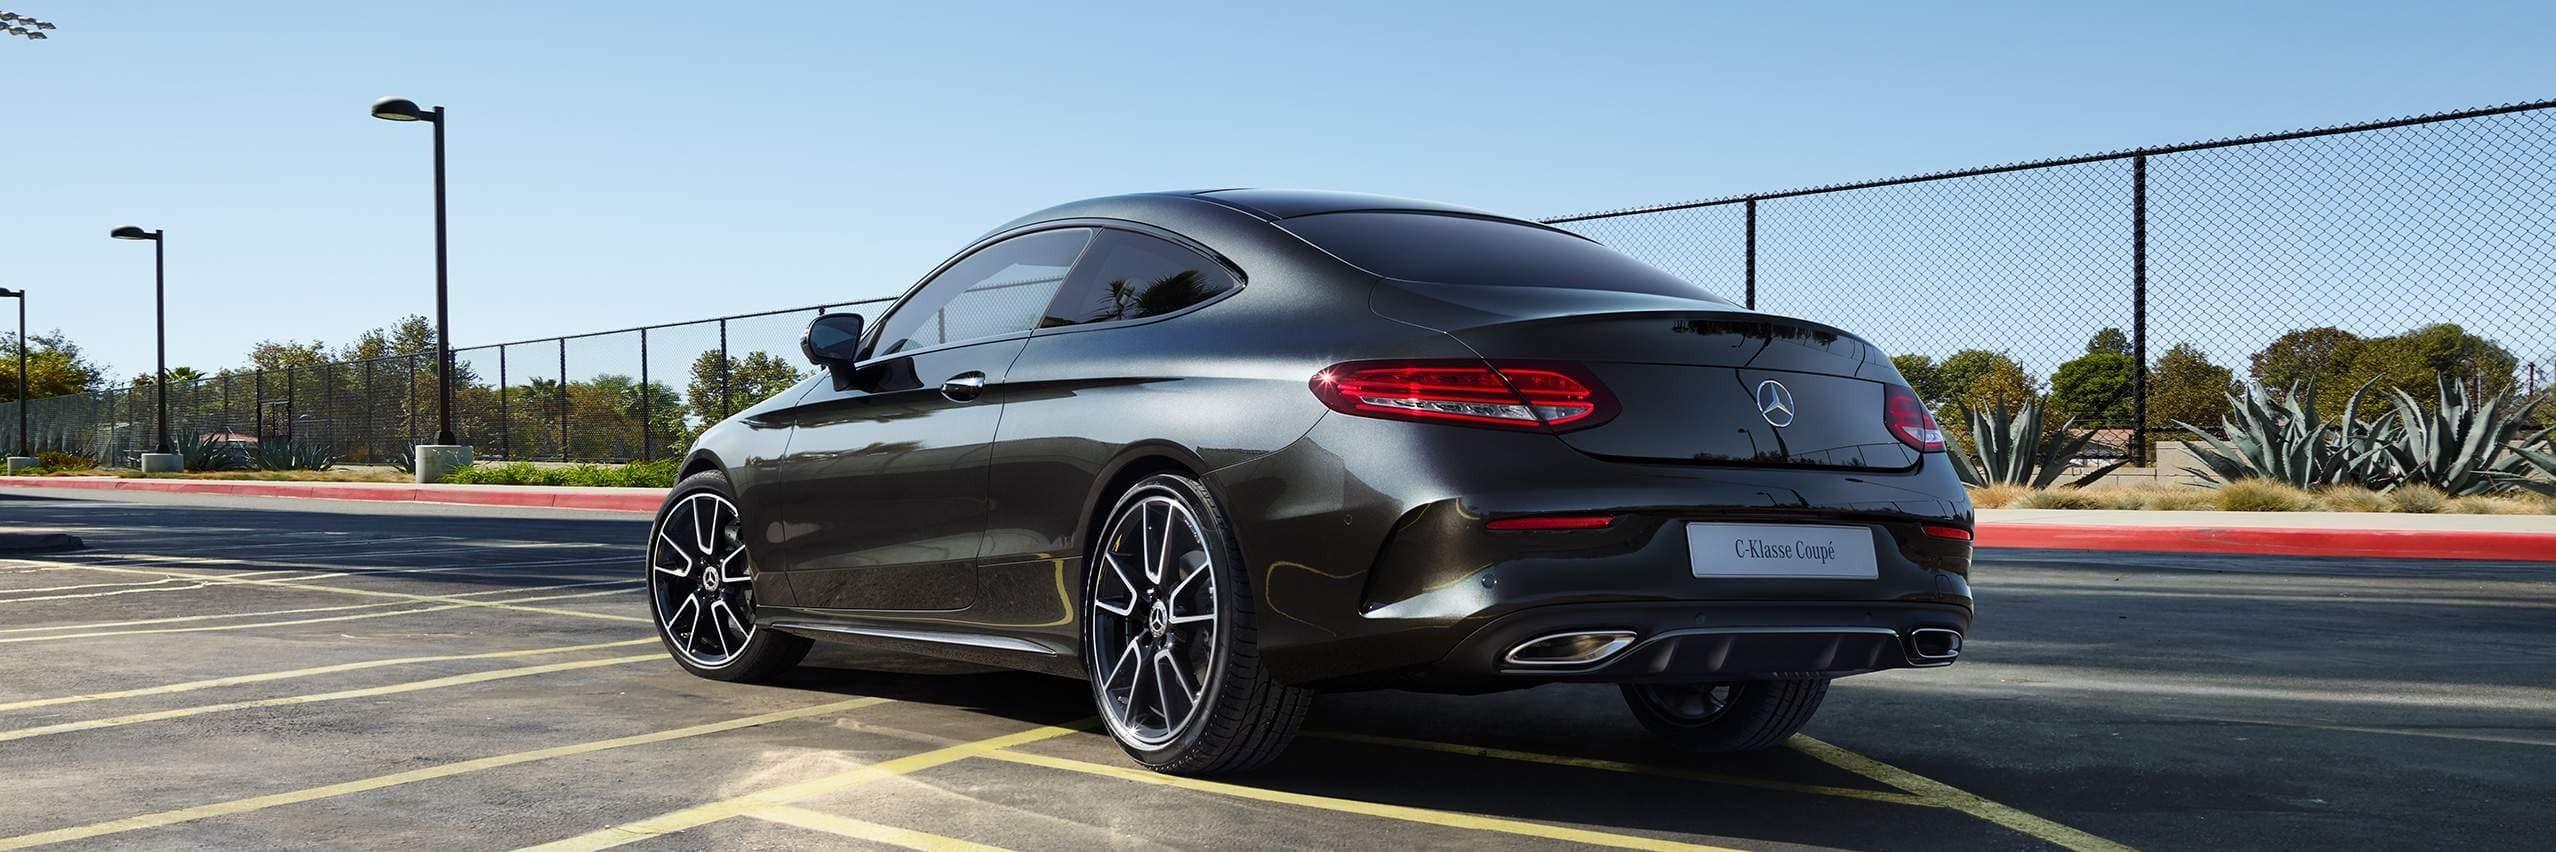 Ціна Mercedes–Benz C–Class Coupe